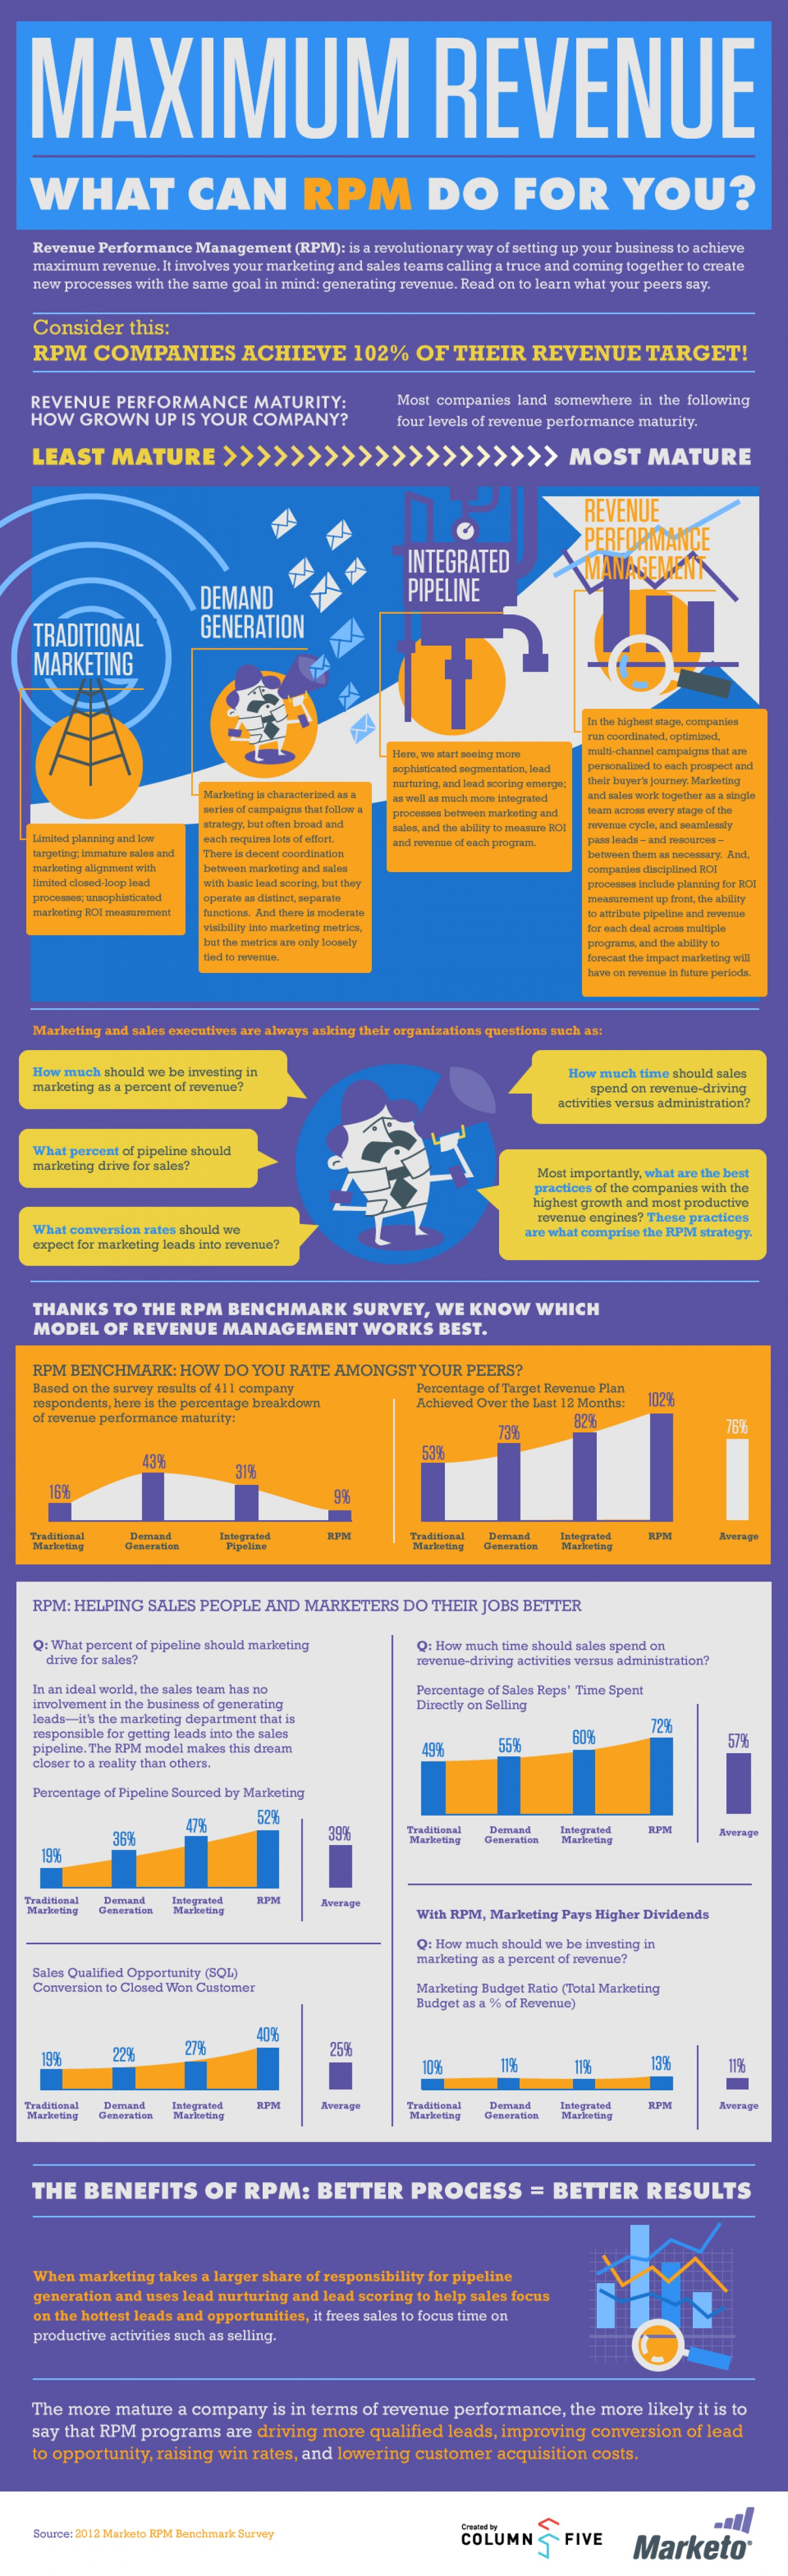 Maximum Revenue: What Can RPM Do For You?